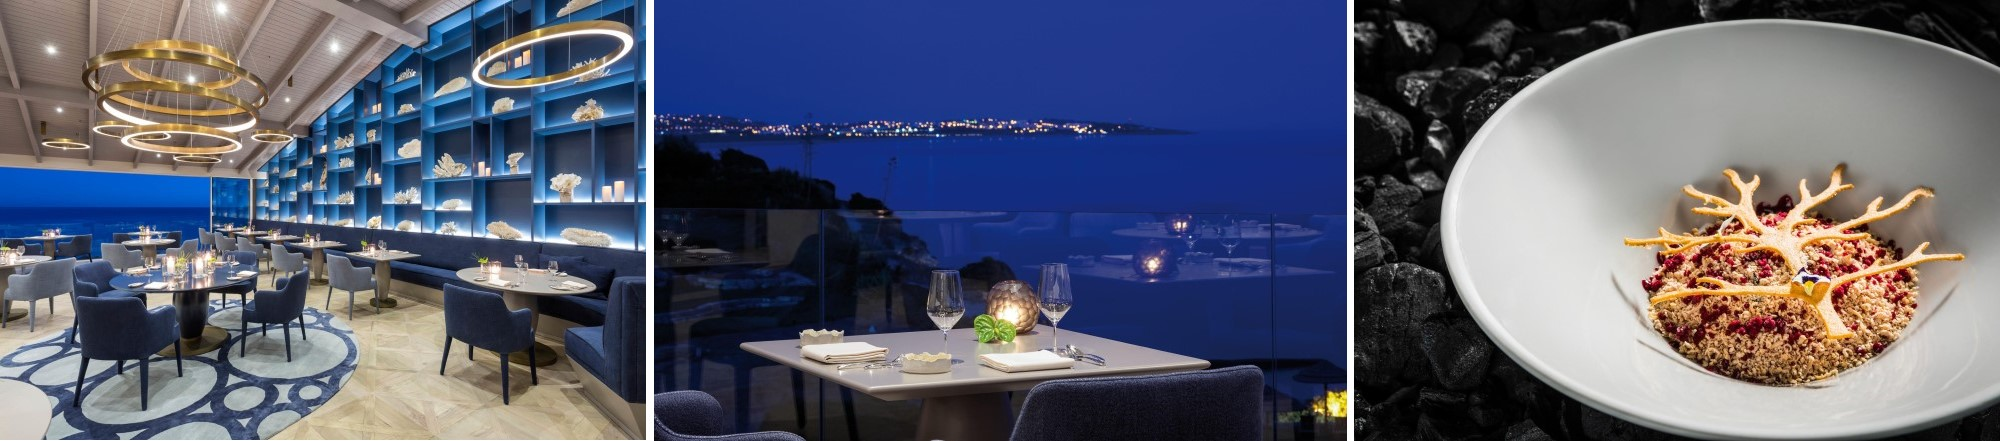 Ocean Restaurant, Porches